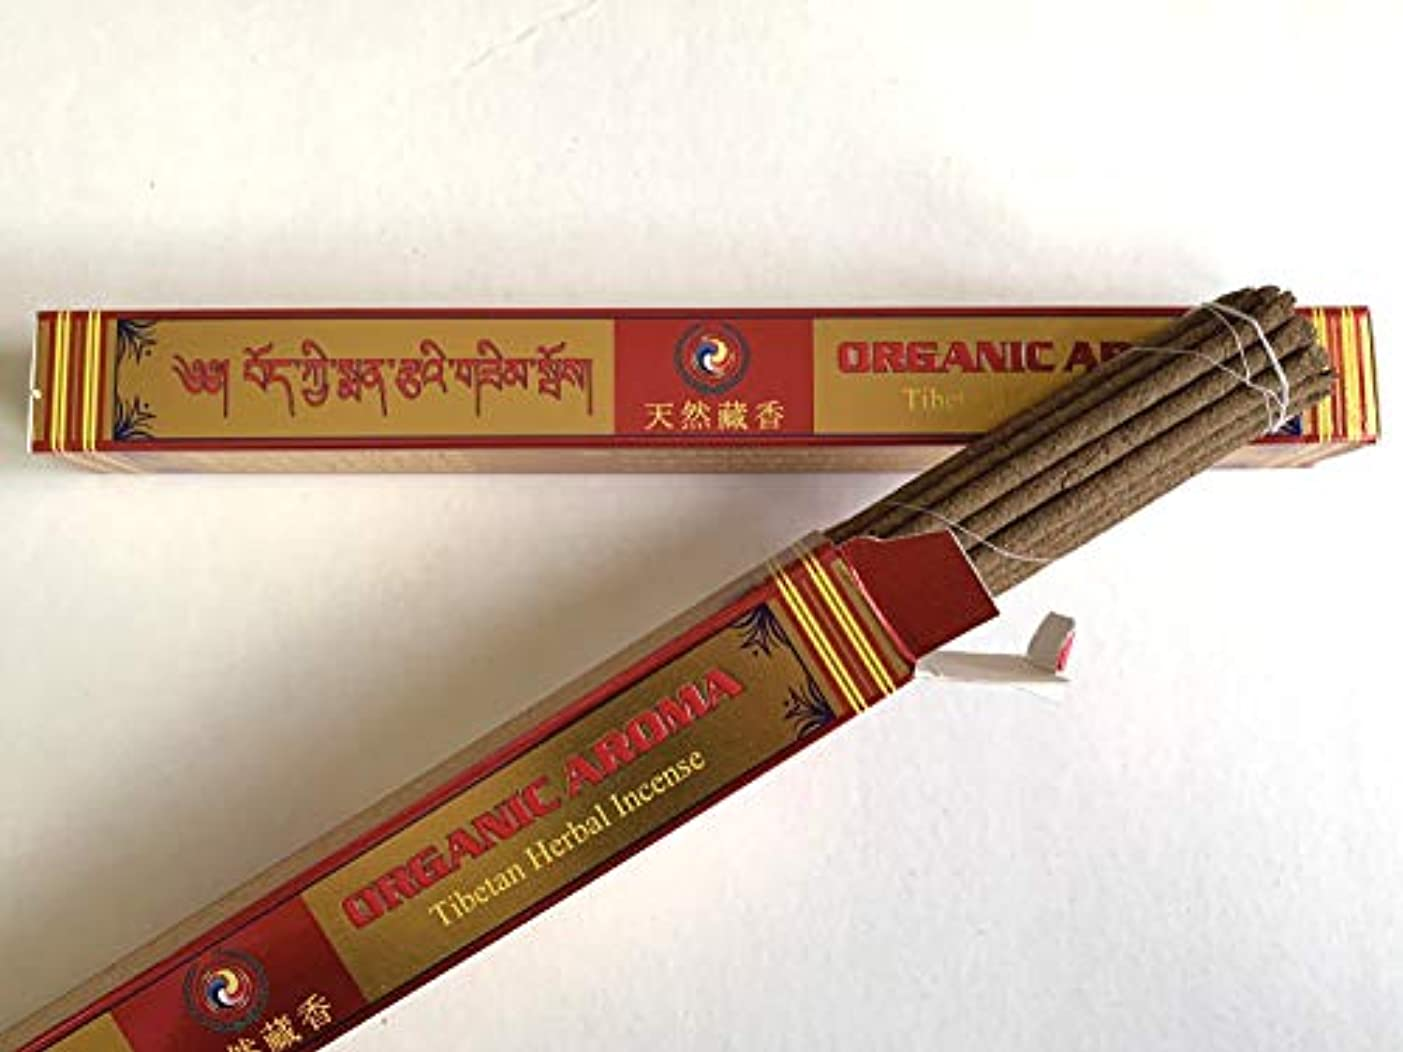 Bonpo Tsang Agarbathi Factory/オーガニックアロマ(天然藏香) ORGANIC AROMA 約25本入り